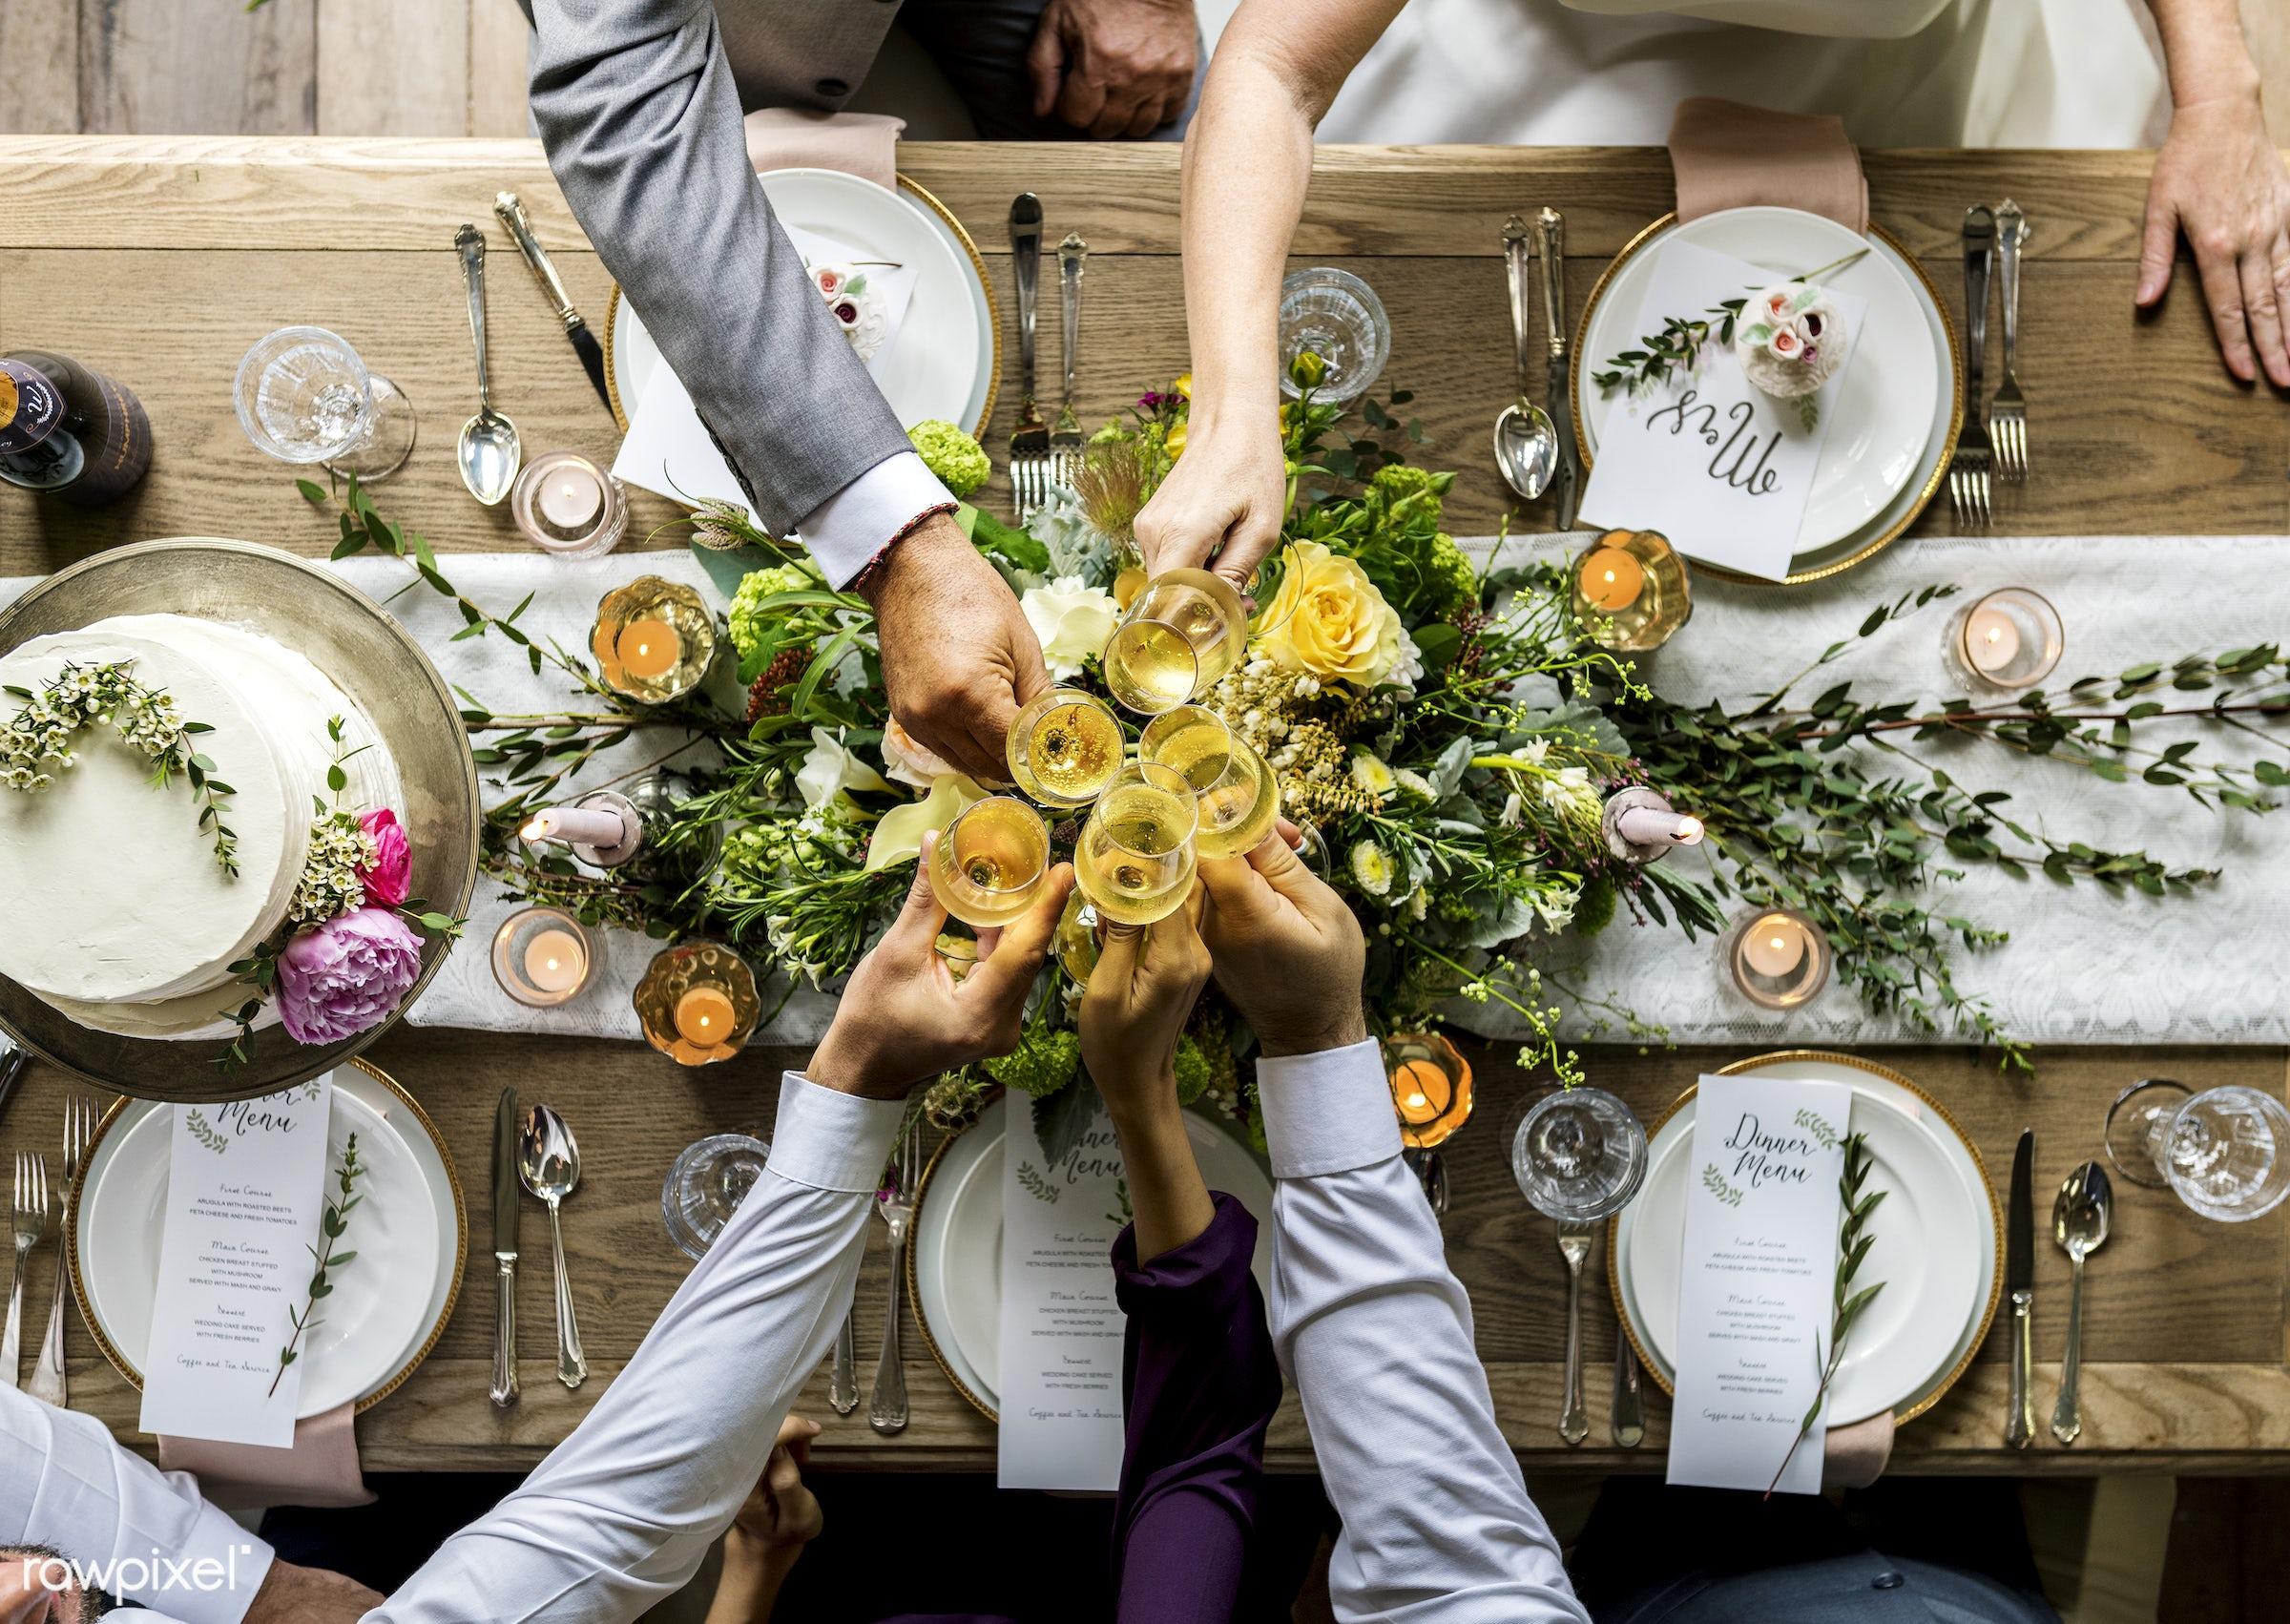 aerial view, arrangement, celebration, diversity, eat, event, flat lay, flatlay, flowers, friends, gather, glasses, group,...